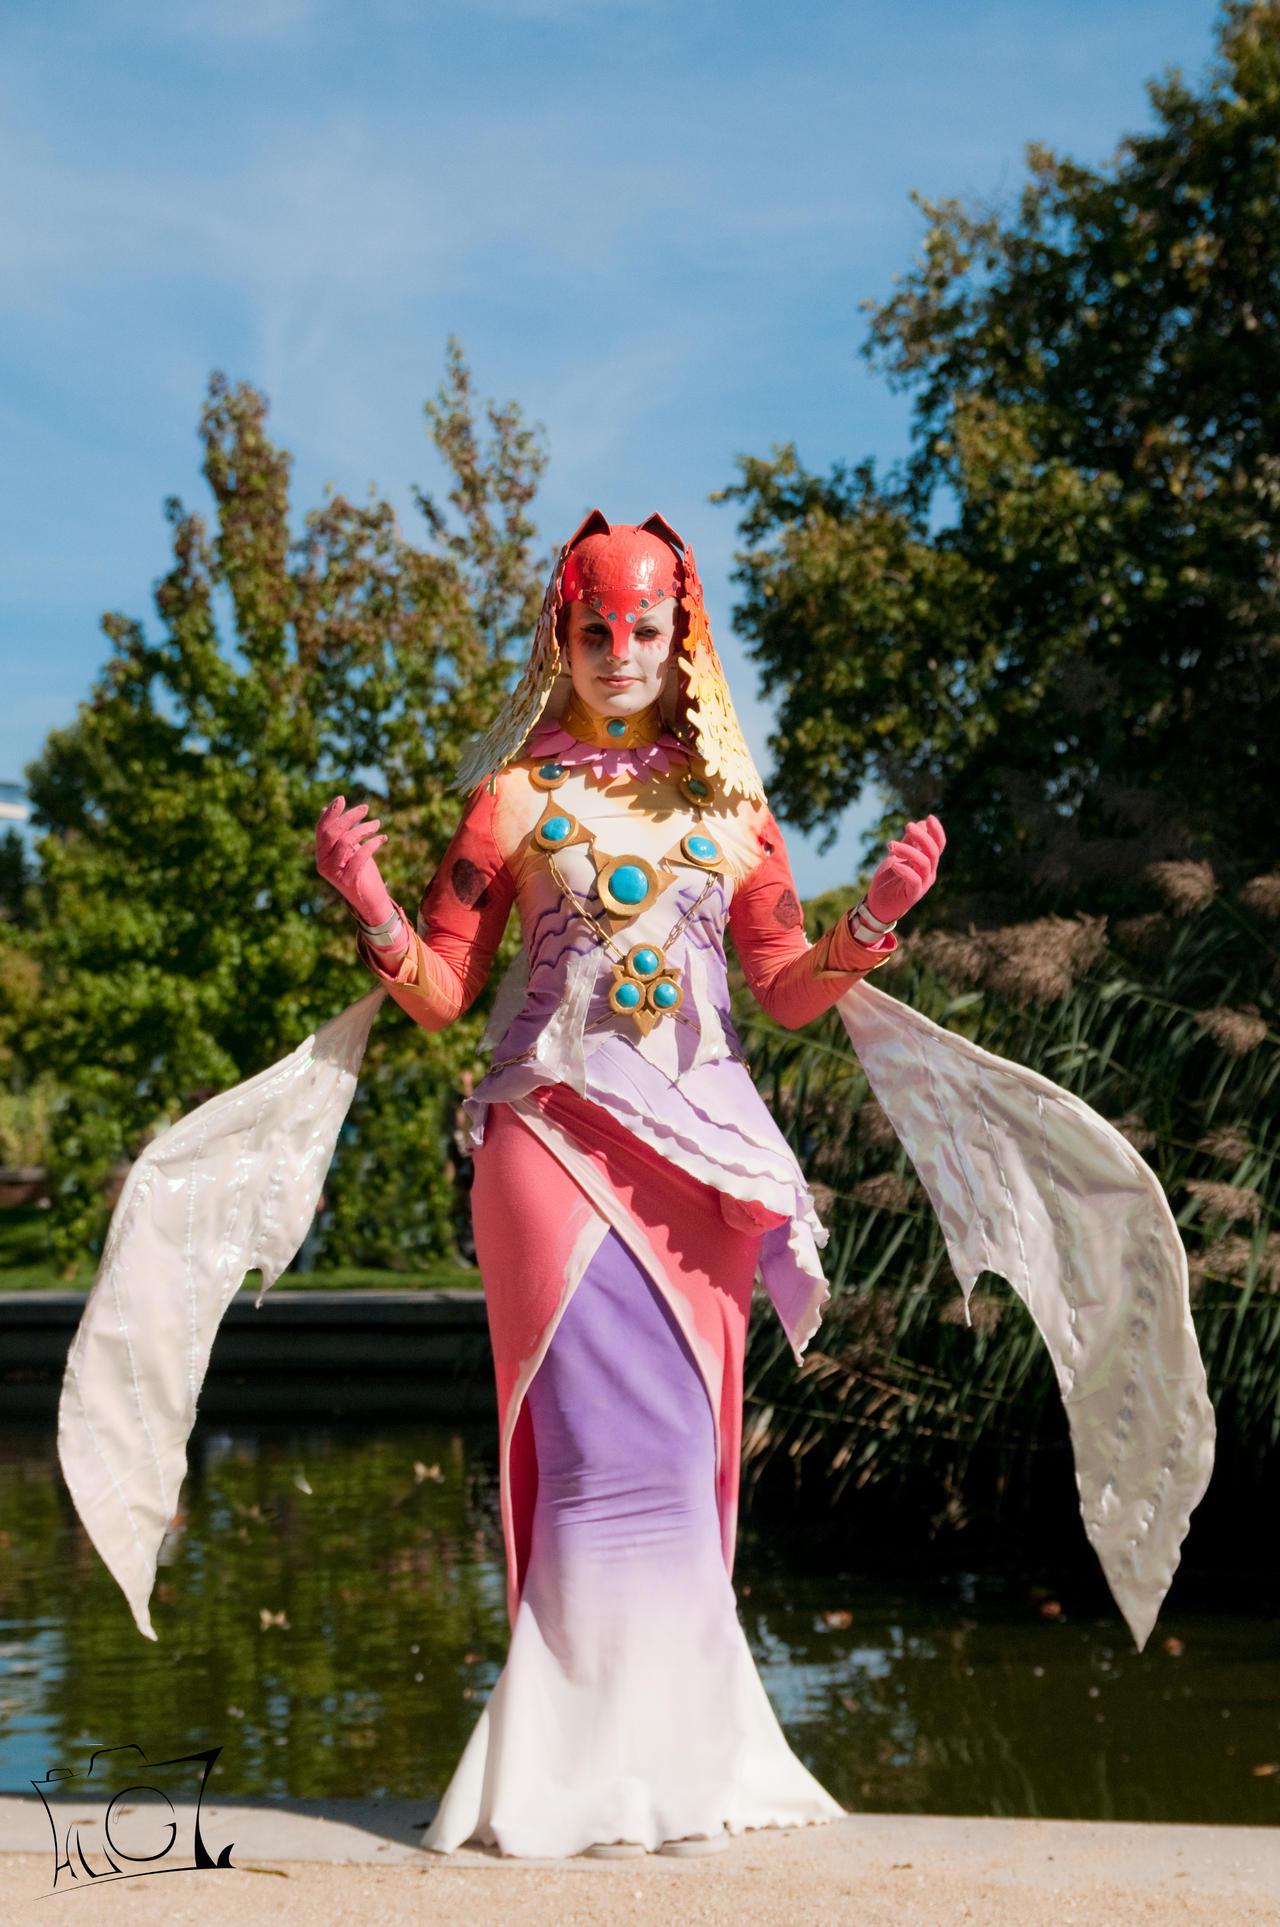 Queen Rutela : Ruler of the Zoras by Narayu